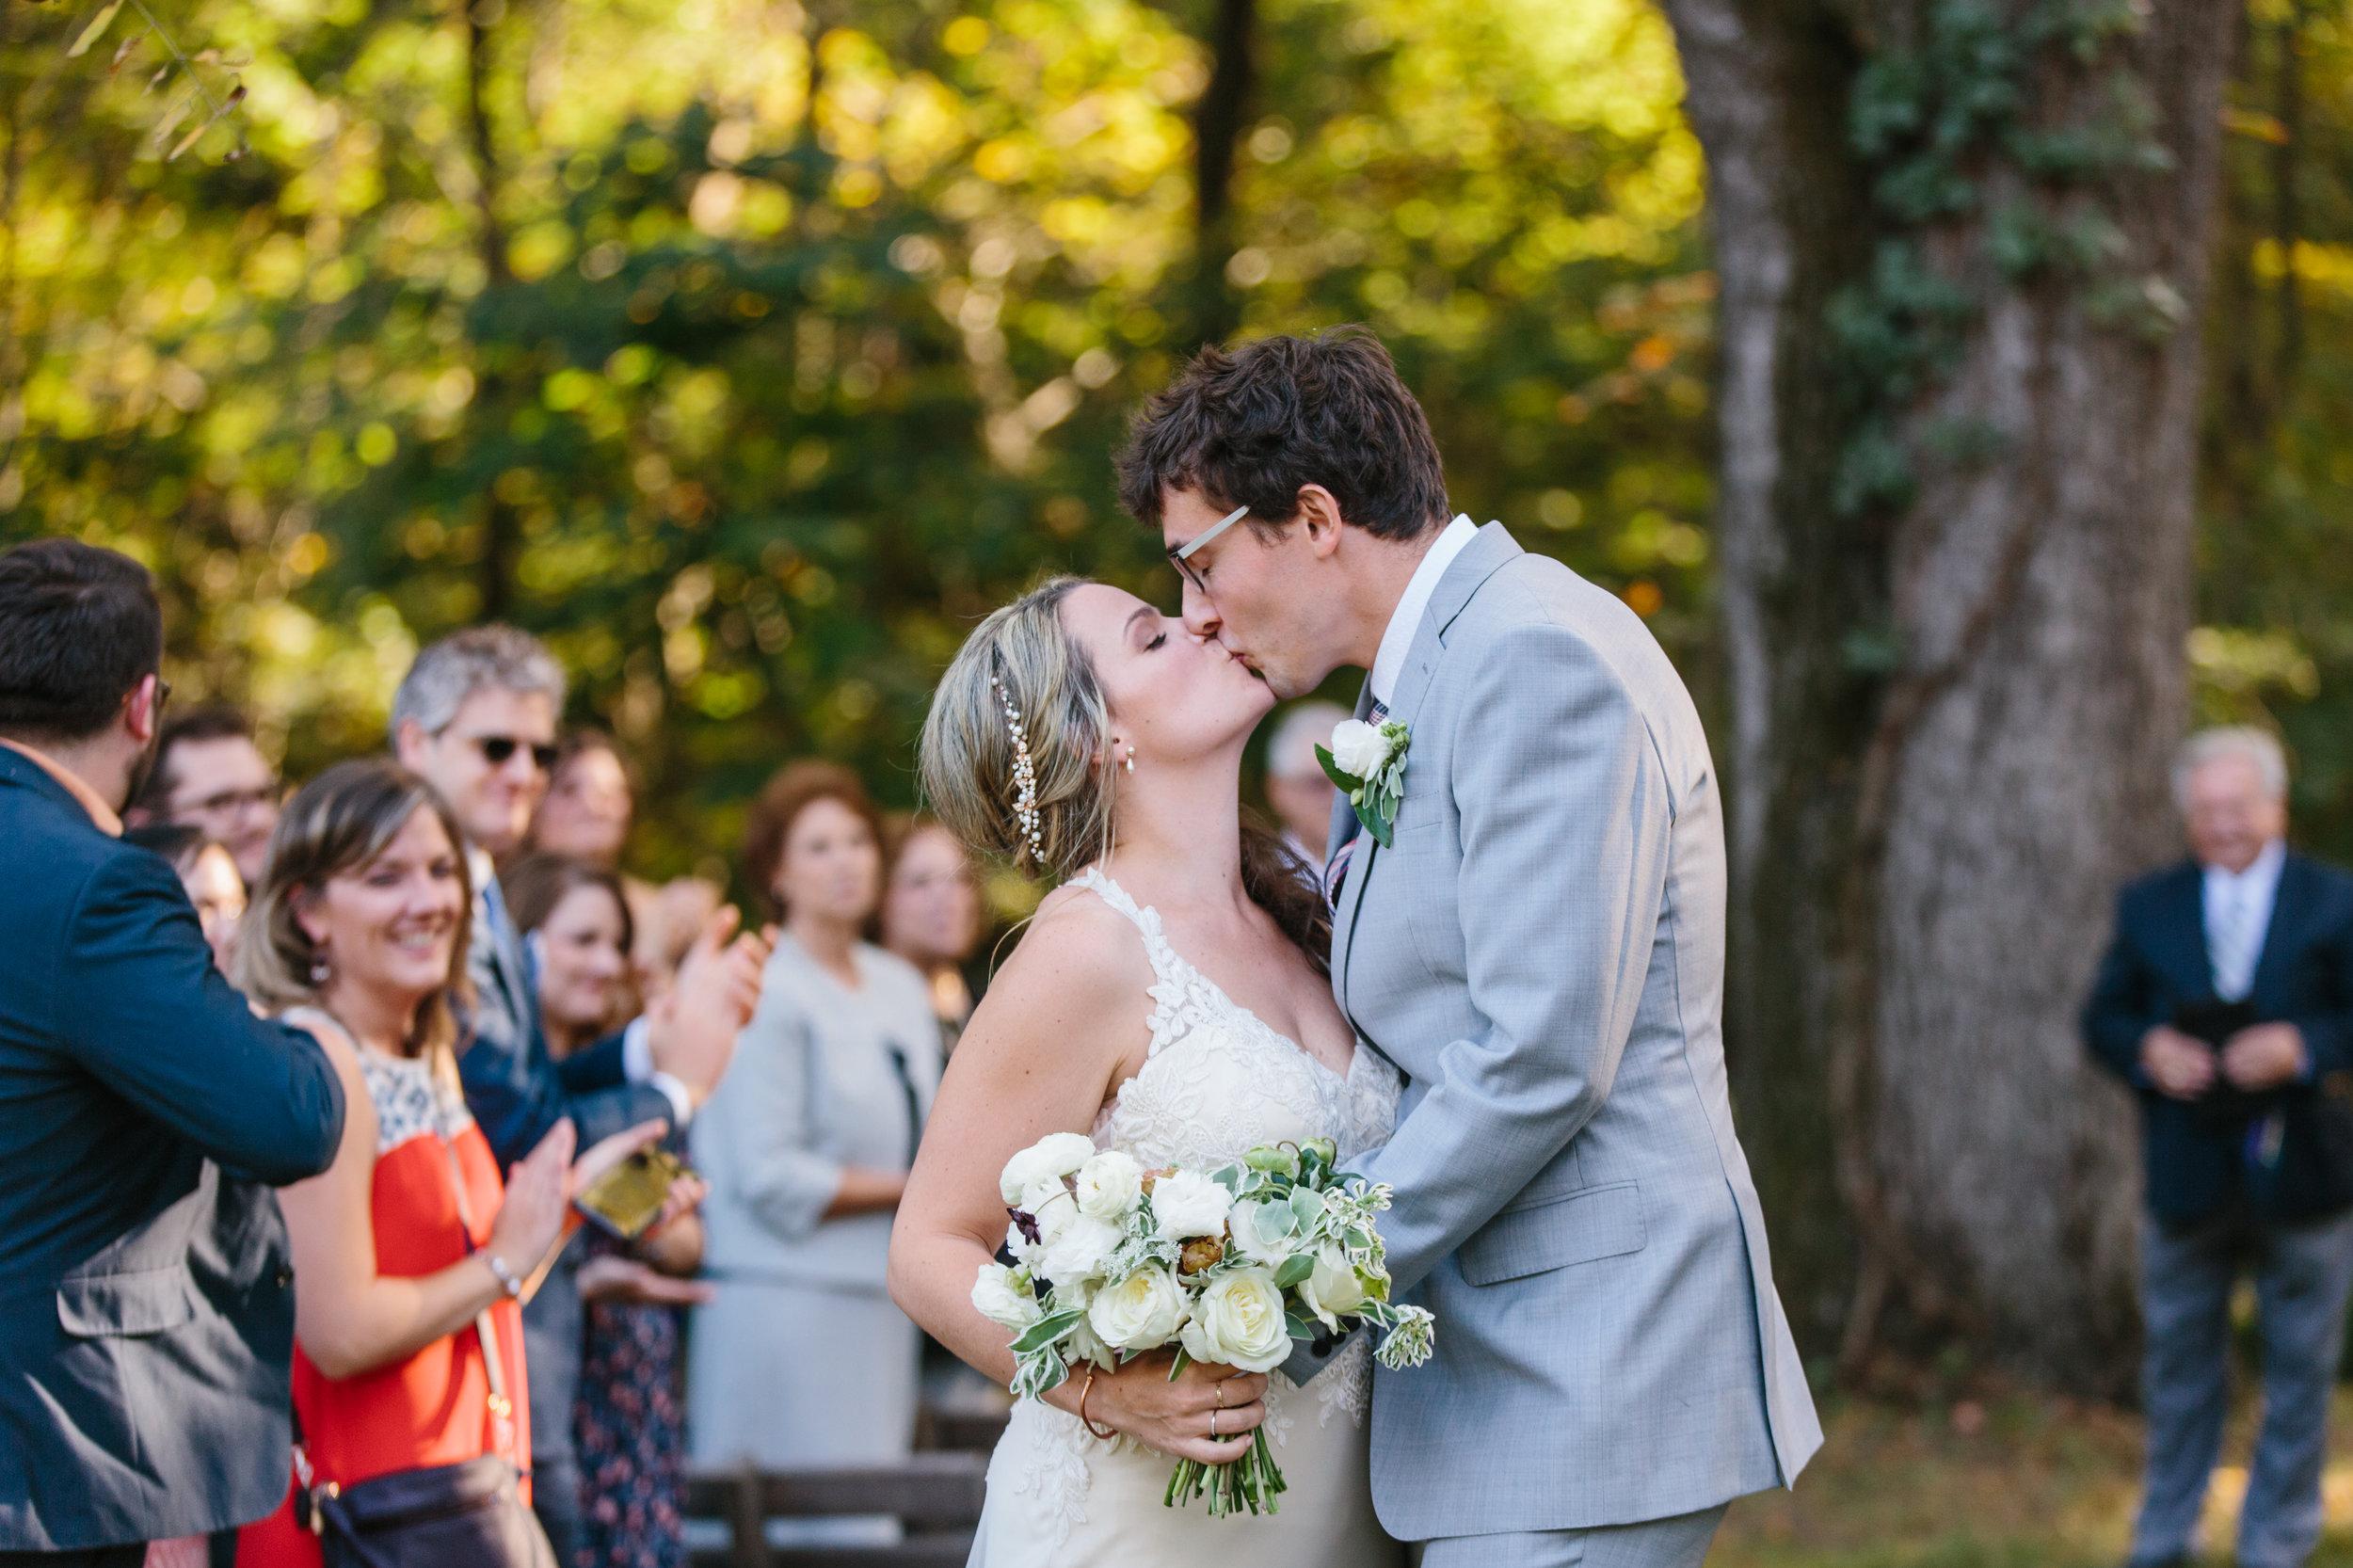 Abby_Simon_Wedding_Abigail_Malone_Photography_nashville_Bloomsbury_Farm-370.jpg